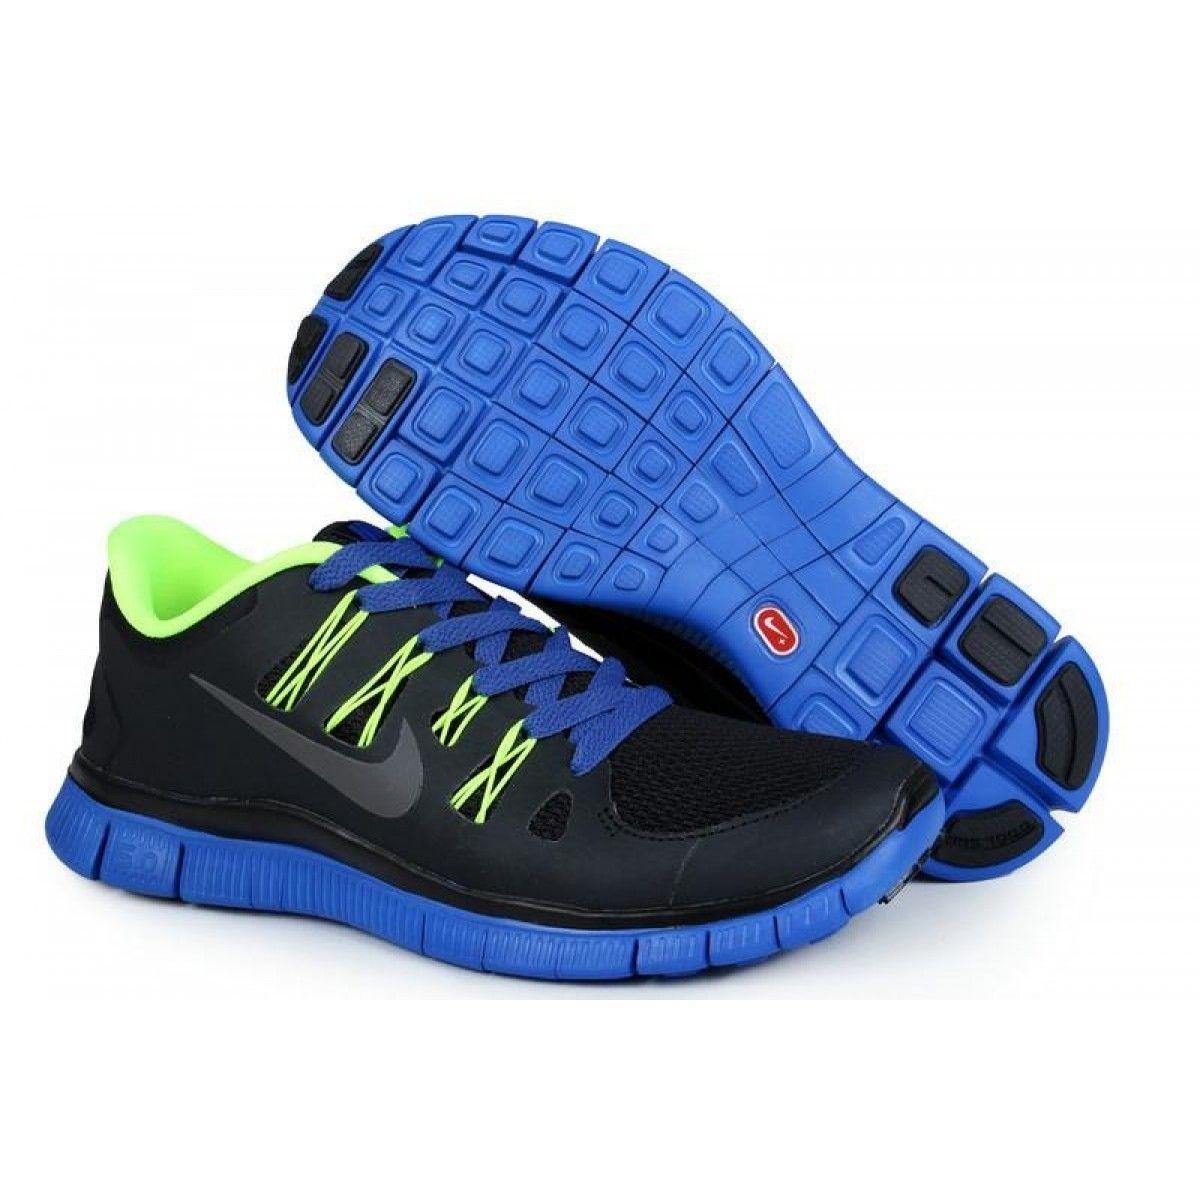 nike free 5.0 v2 Nike Shoes Basketball Nike Free 5.0 V2 Mens Black/Blue | Neon nike ...